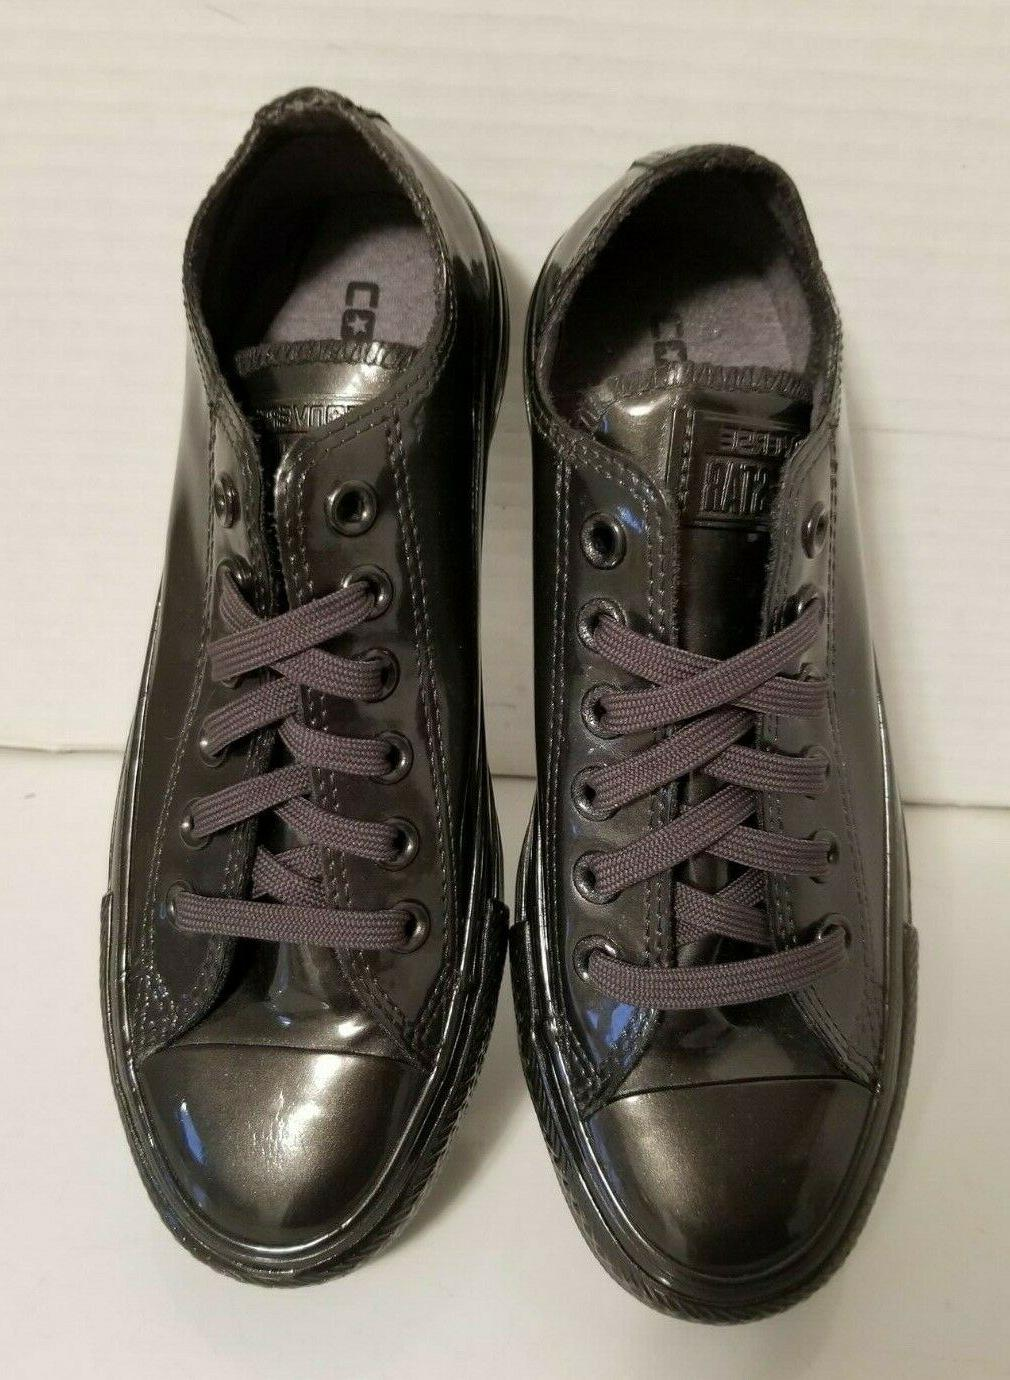 Converse Water Resistant Taylors Metallic Sneakers 6.5